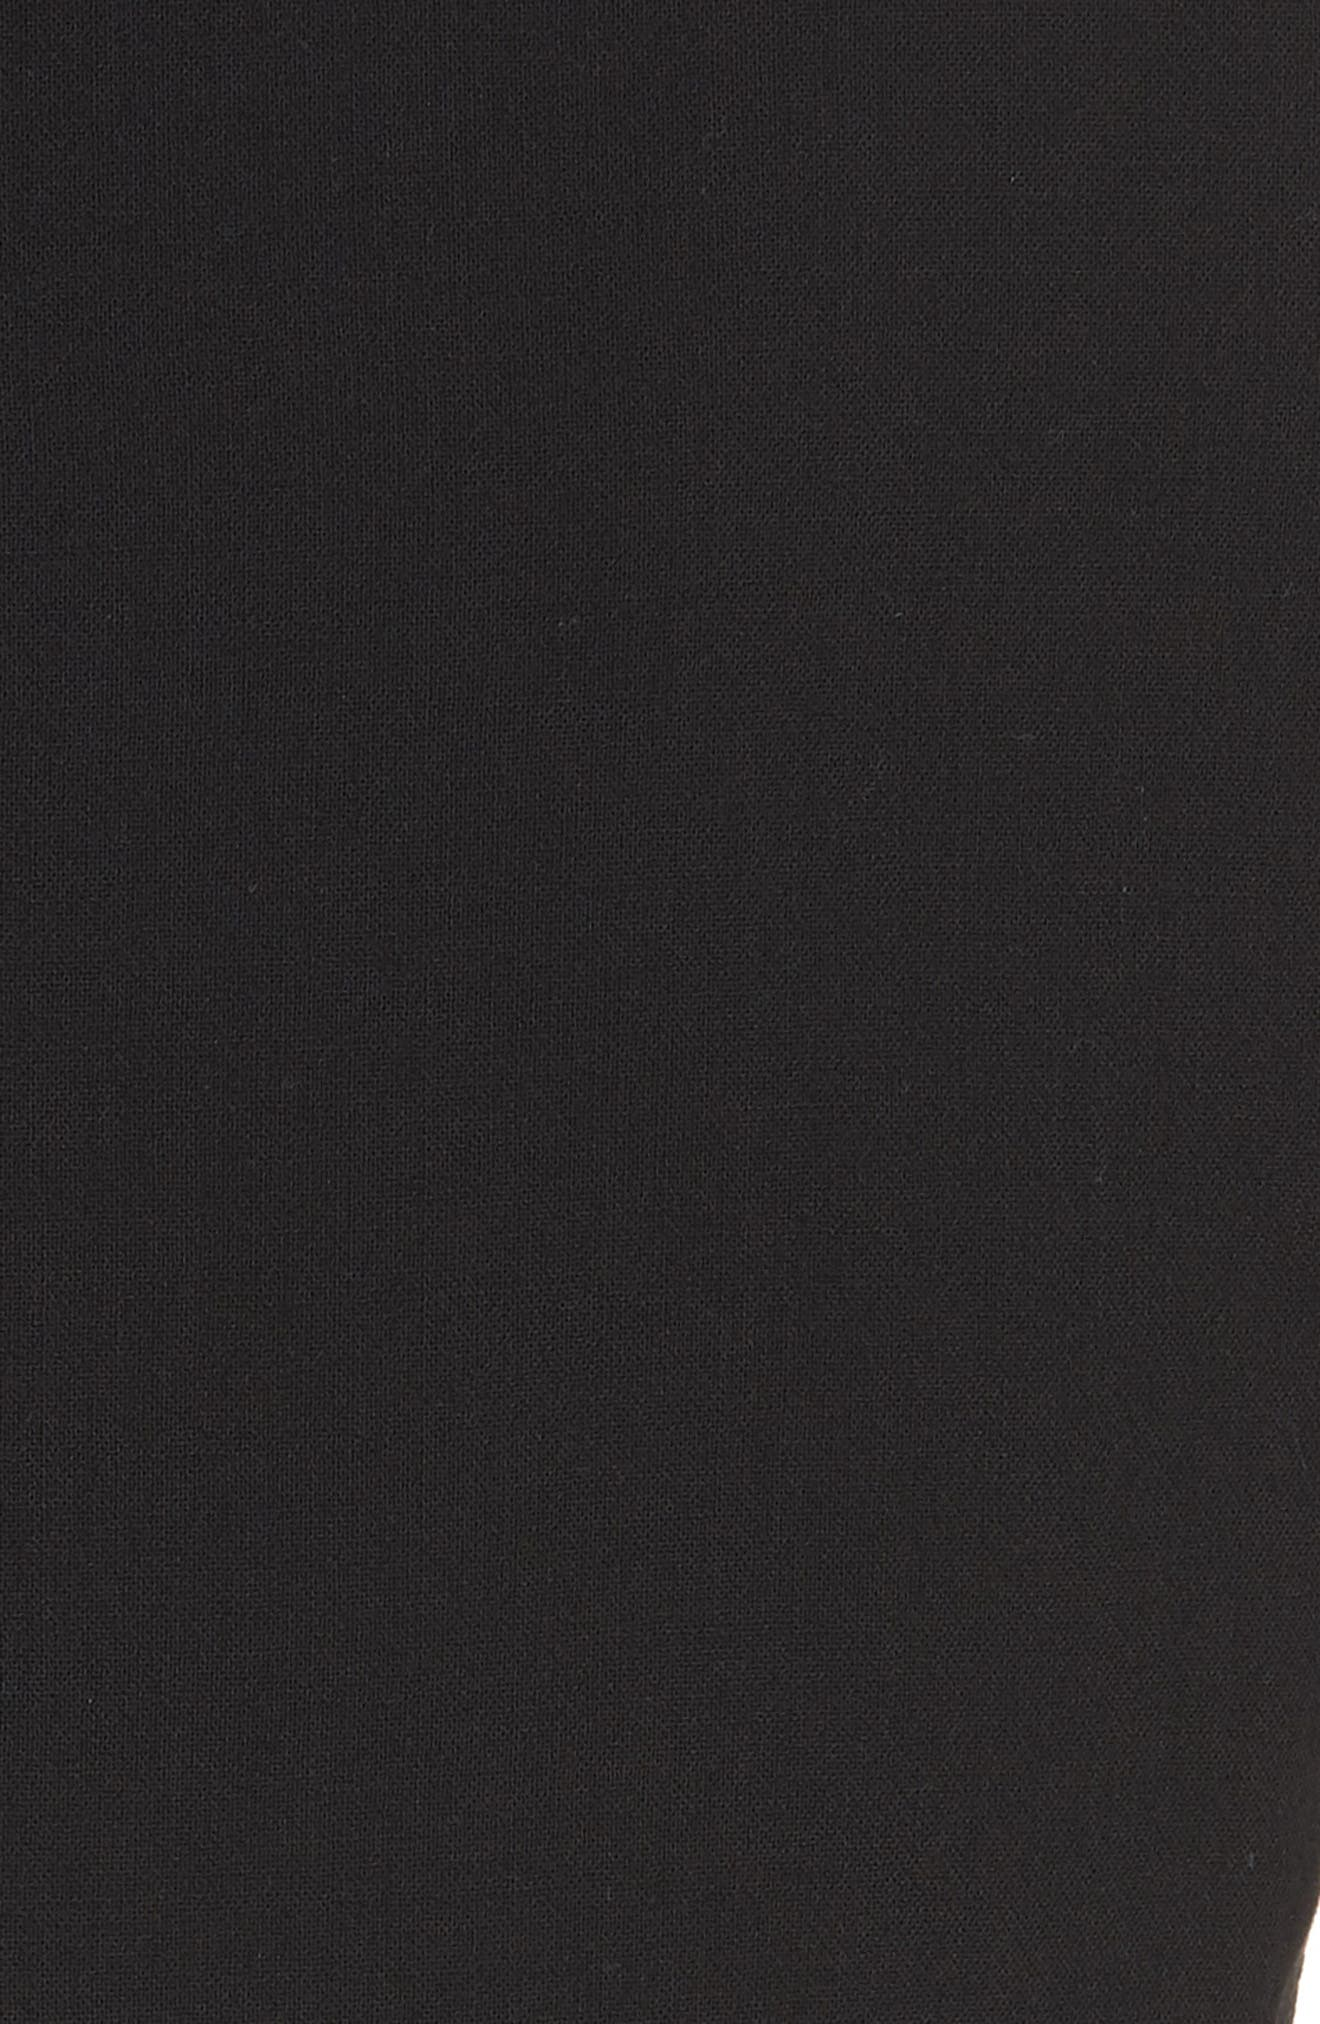 Ilke Double Face Wool Blend Jacket,                             Alternate thumbnail 7, color,                             BLACK